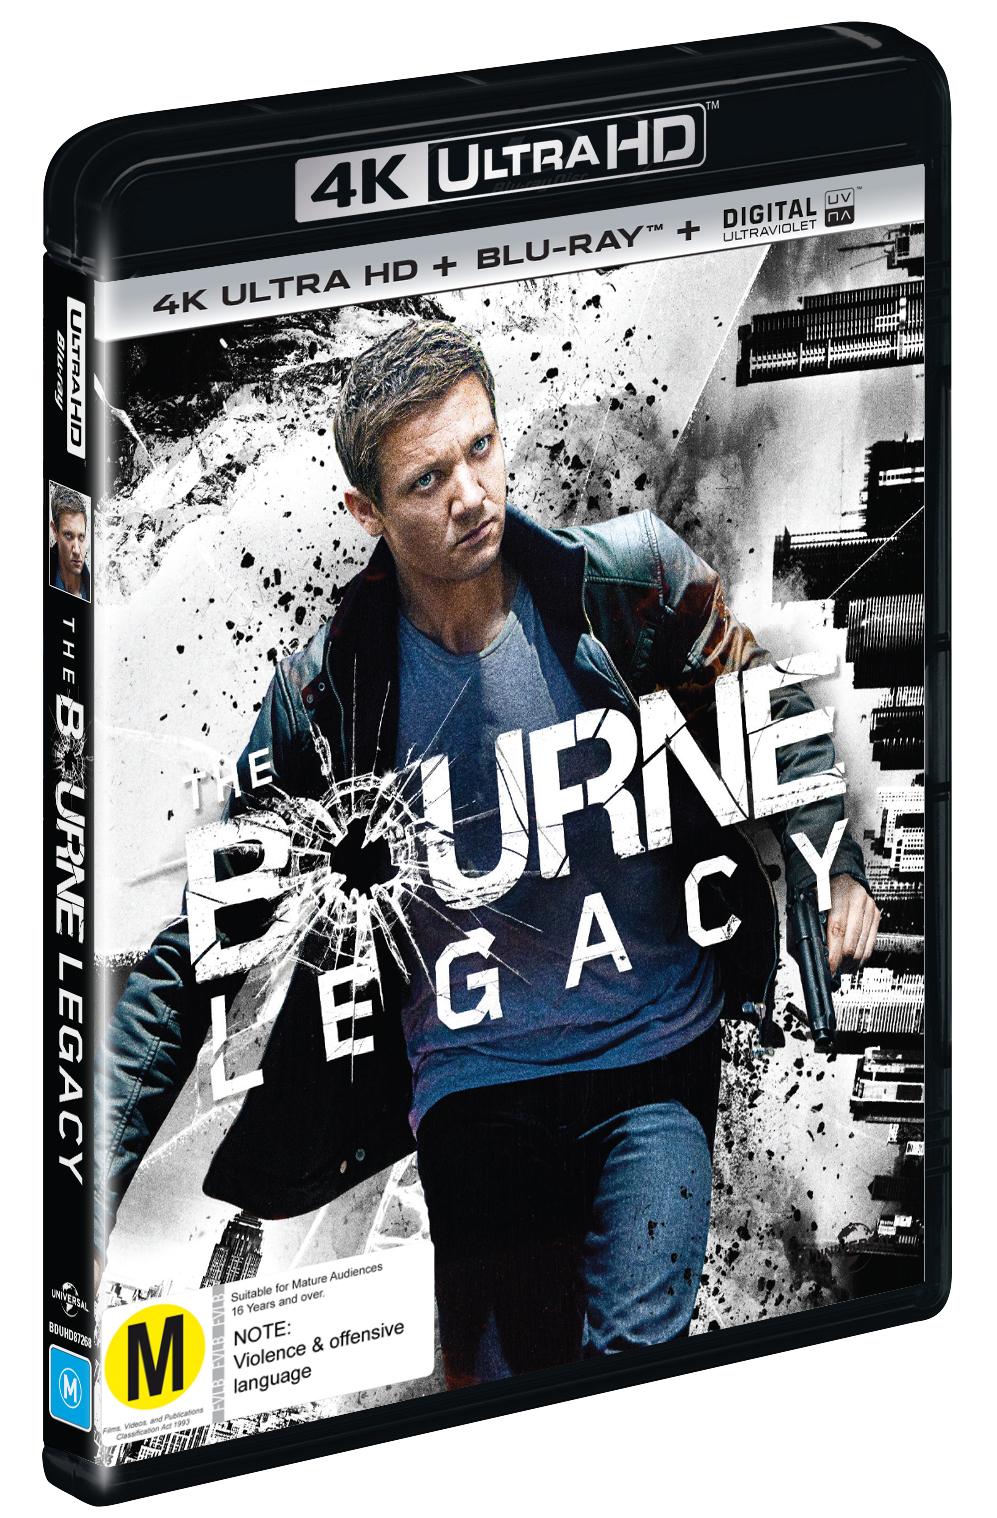 The Bourne Legacy on Blu-ray, UHD Blu-ray image